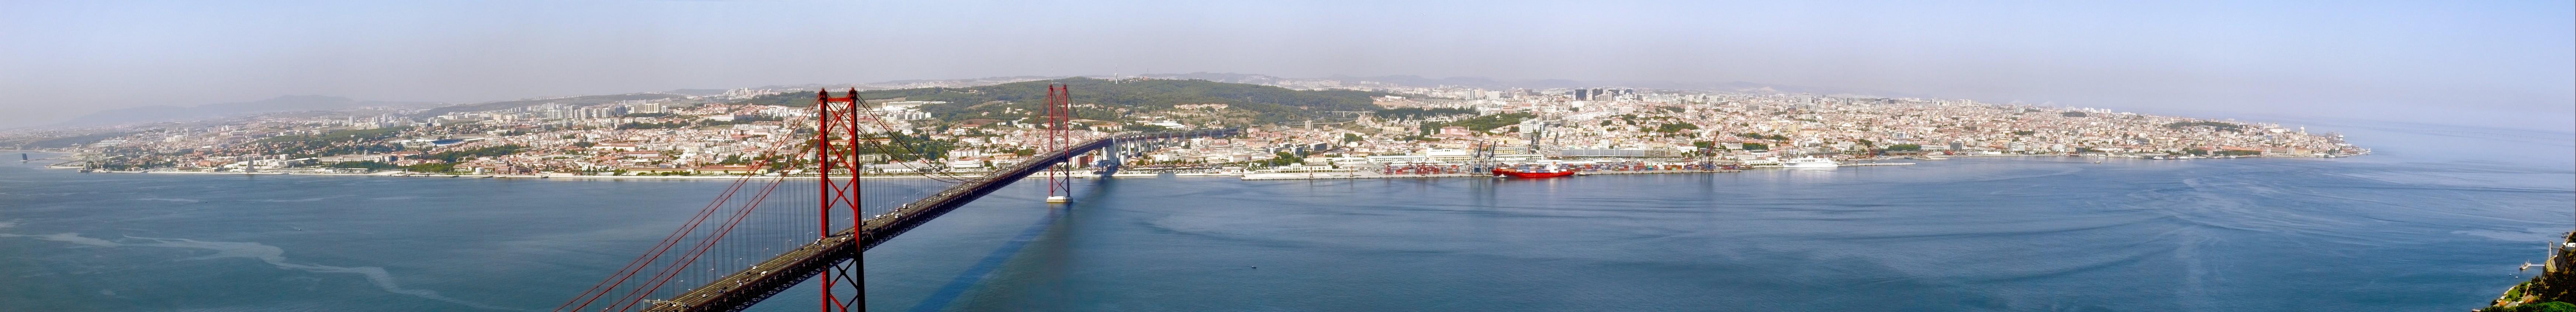 https://upload.wikimedia.org/wikipedia/commons/6/6e/Lisboa-lisbon-_panorama.jpg